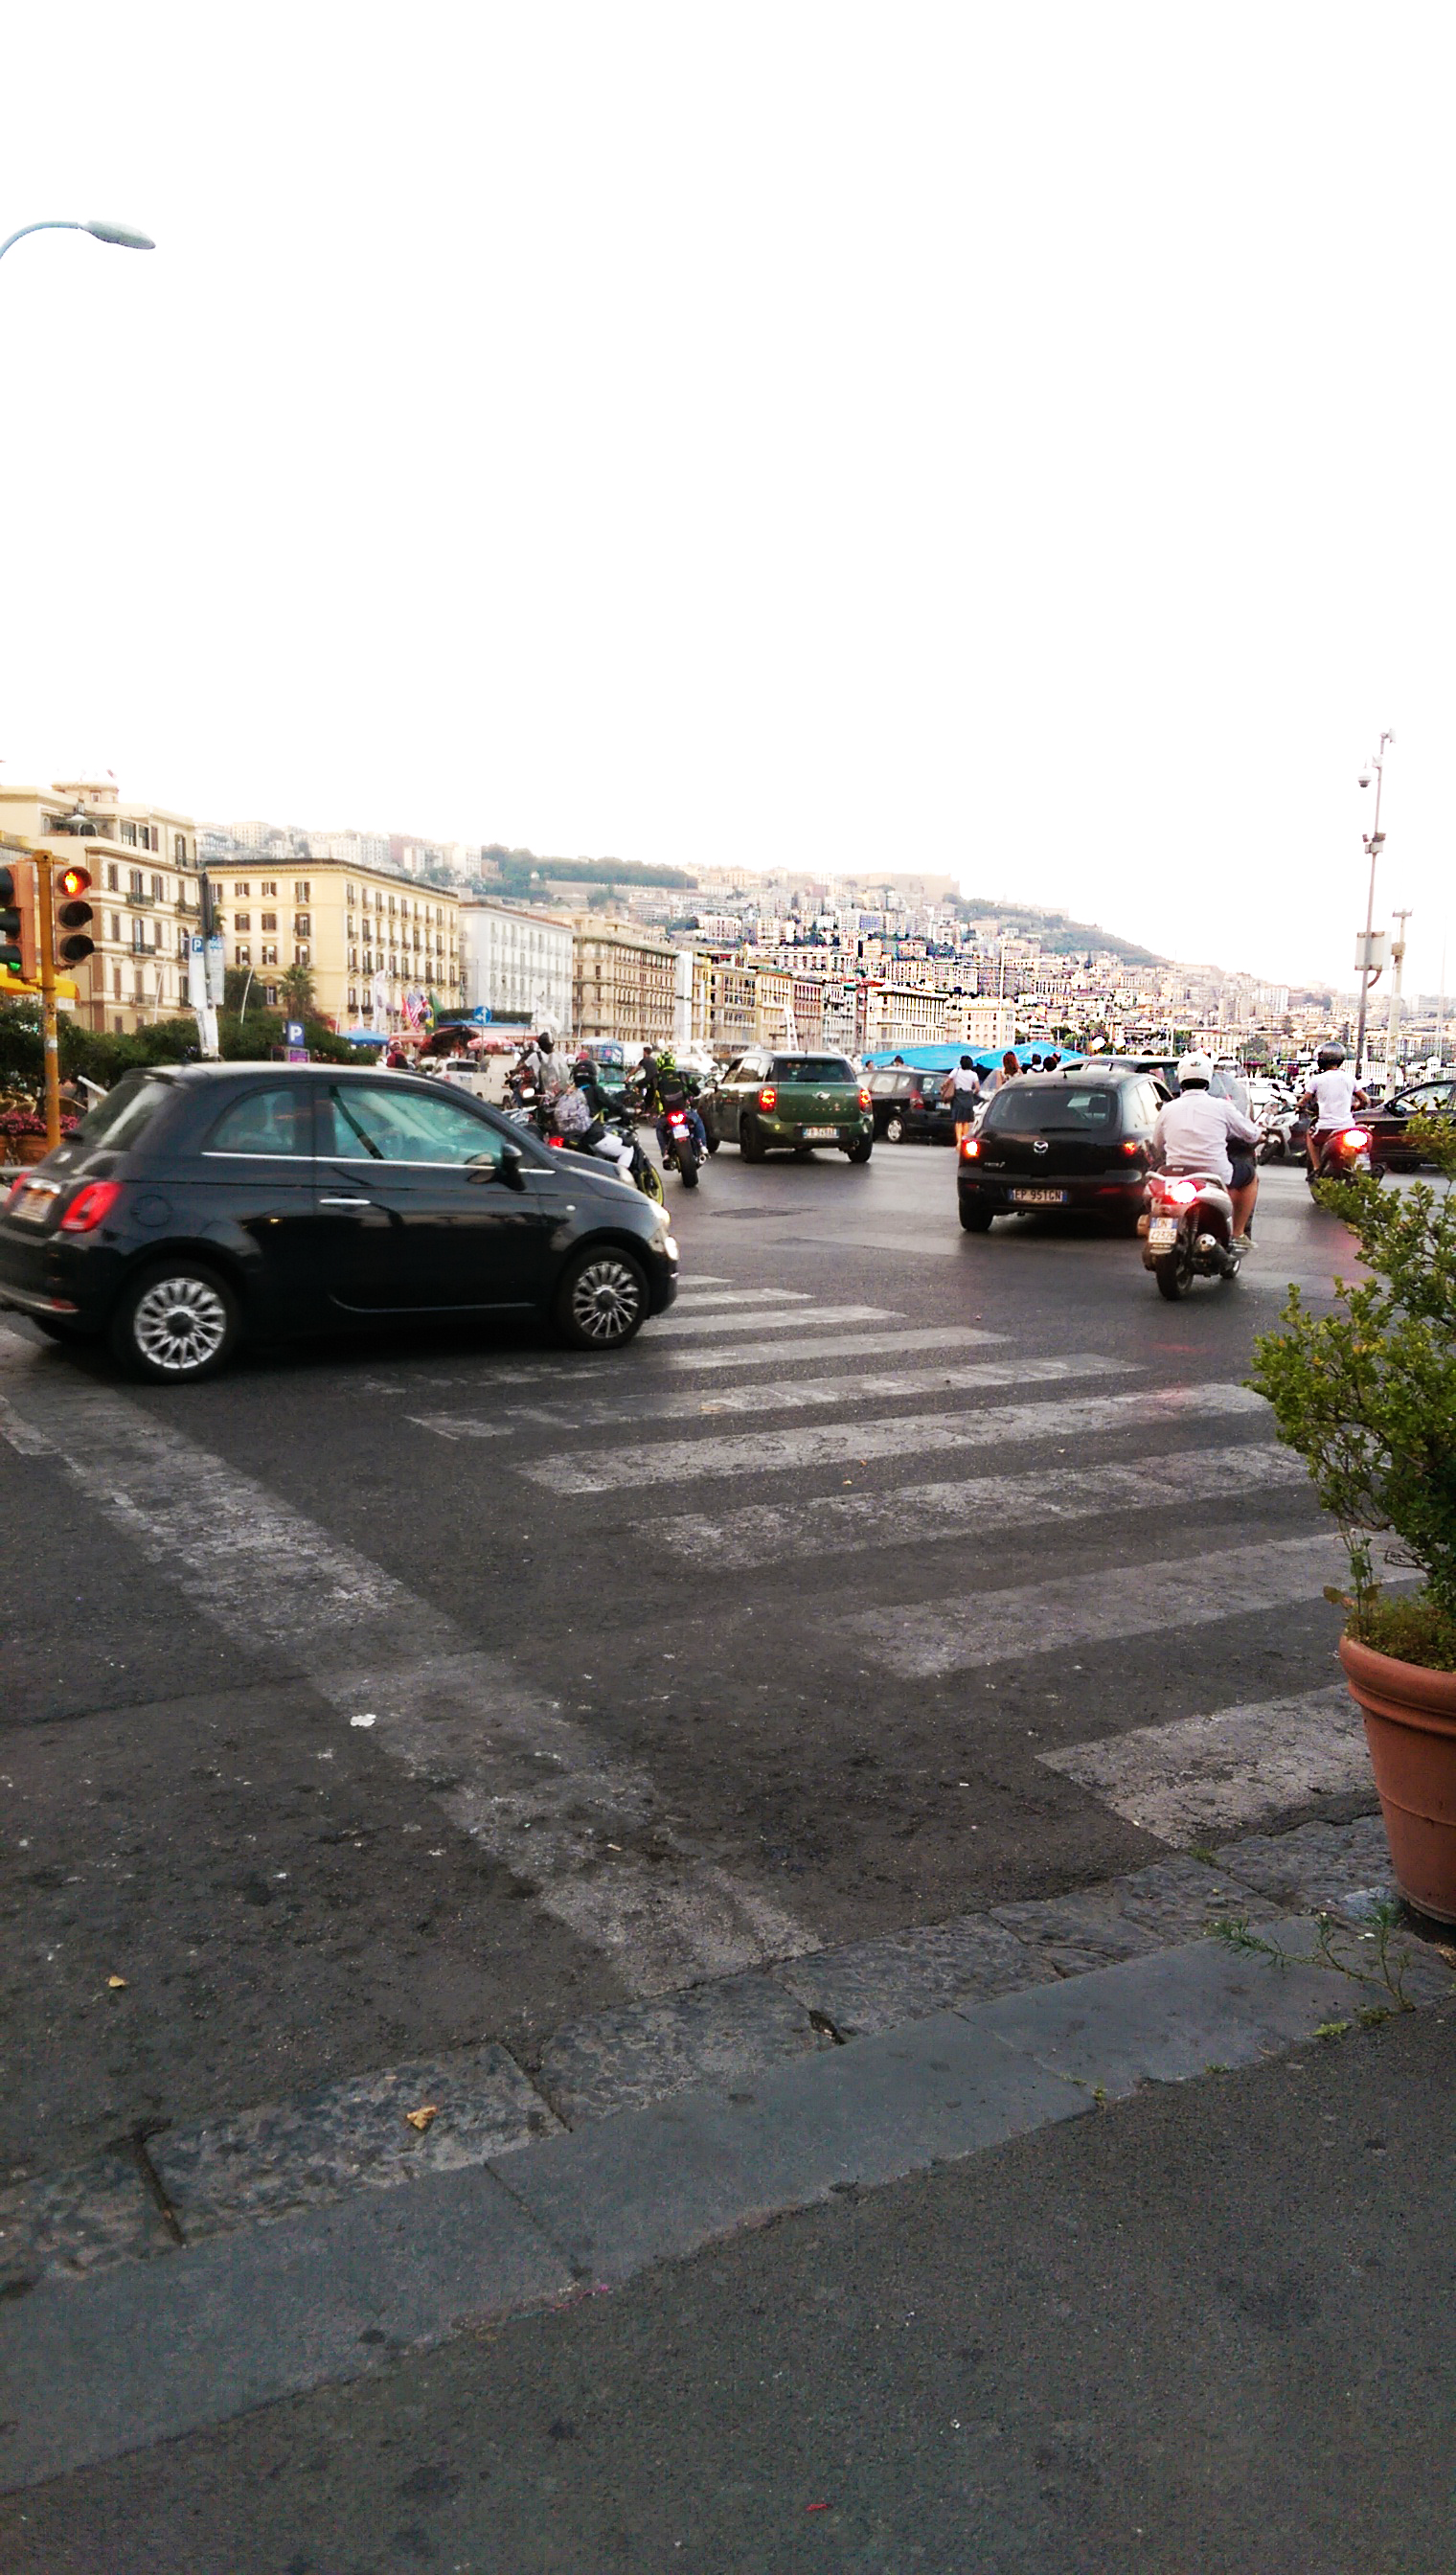 Cars driving in Posillipo